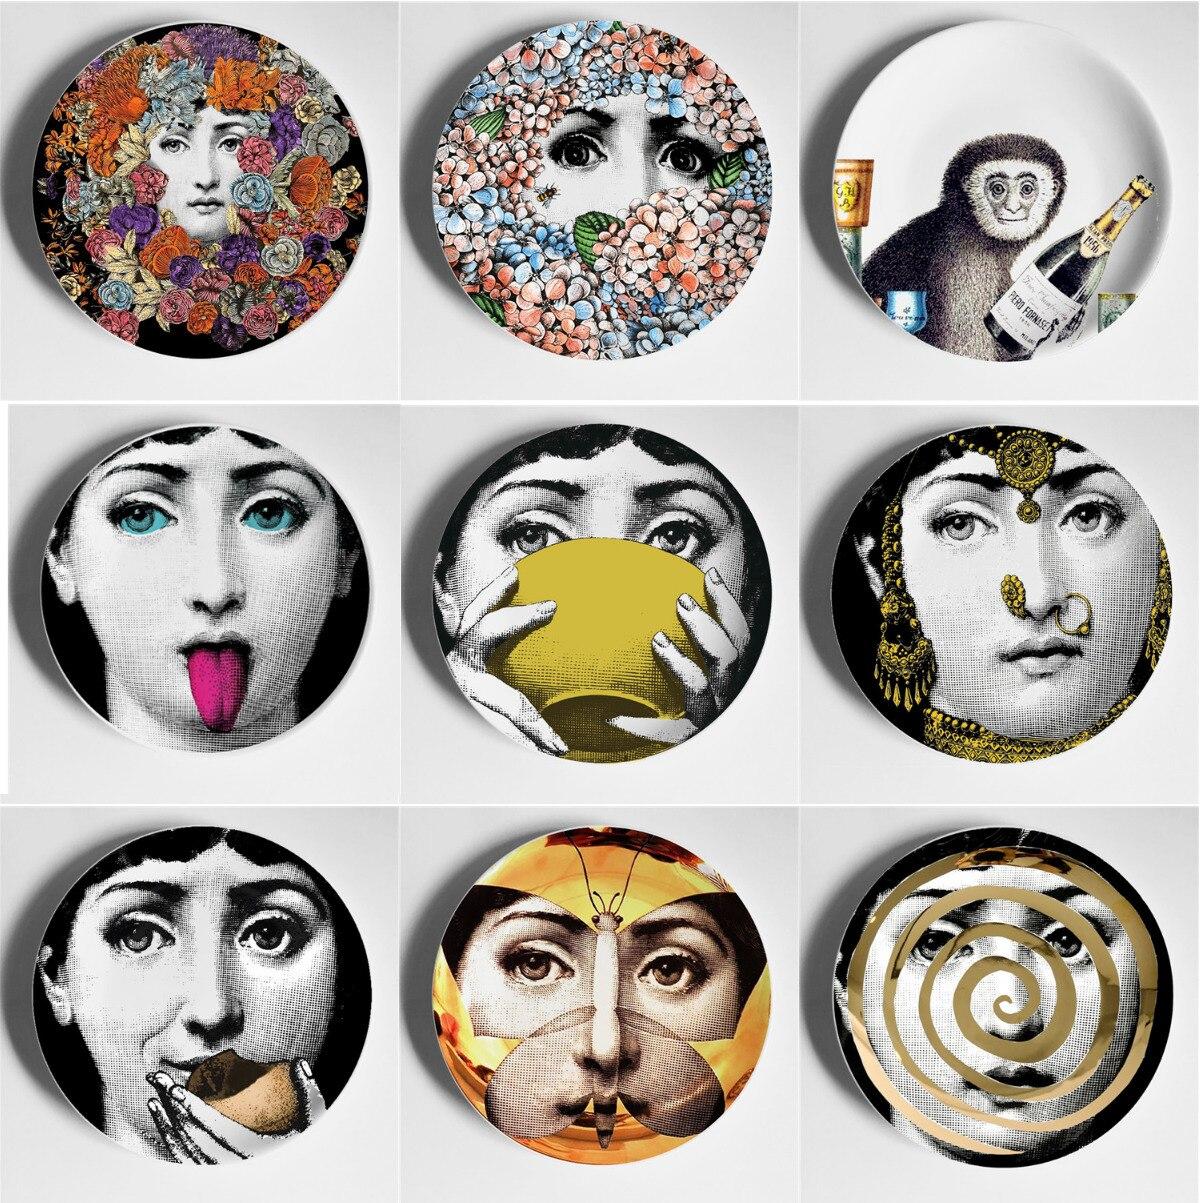 Dekorative Wand Platte Wand Dekoration Platte Kunst Platte Zimmer/haus/hotel Decor Cavalieri Lina Gesicht Keramik Handwerk Wand platten